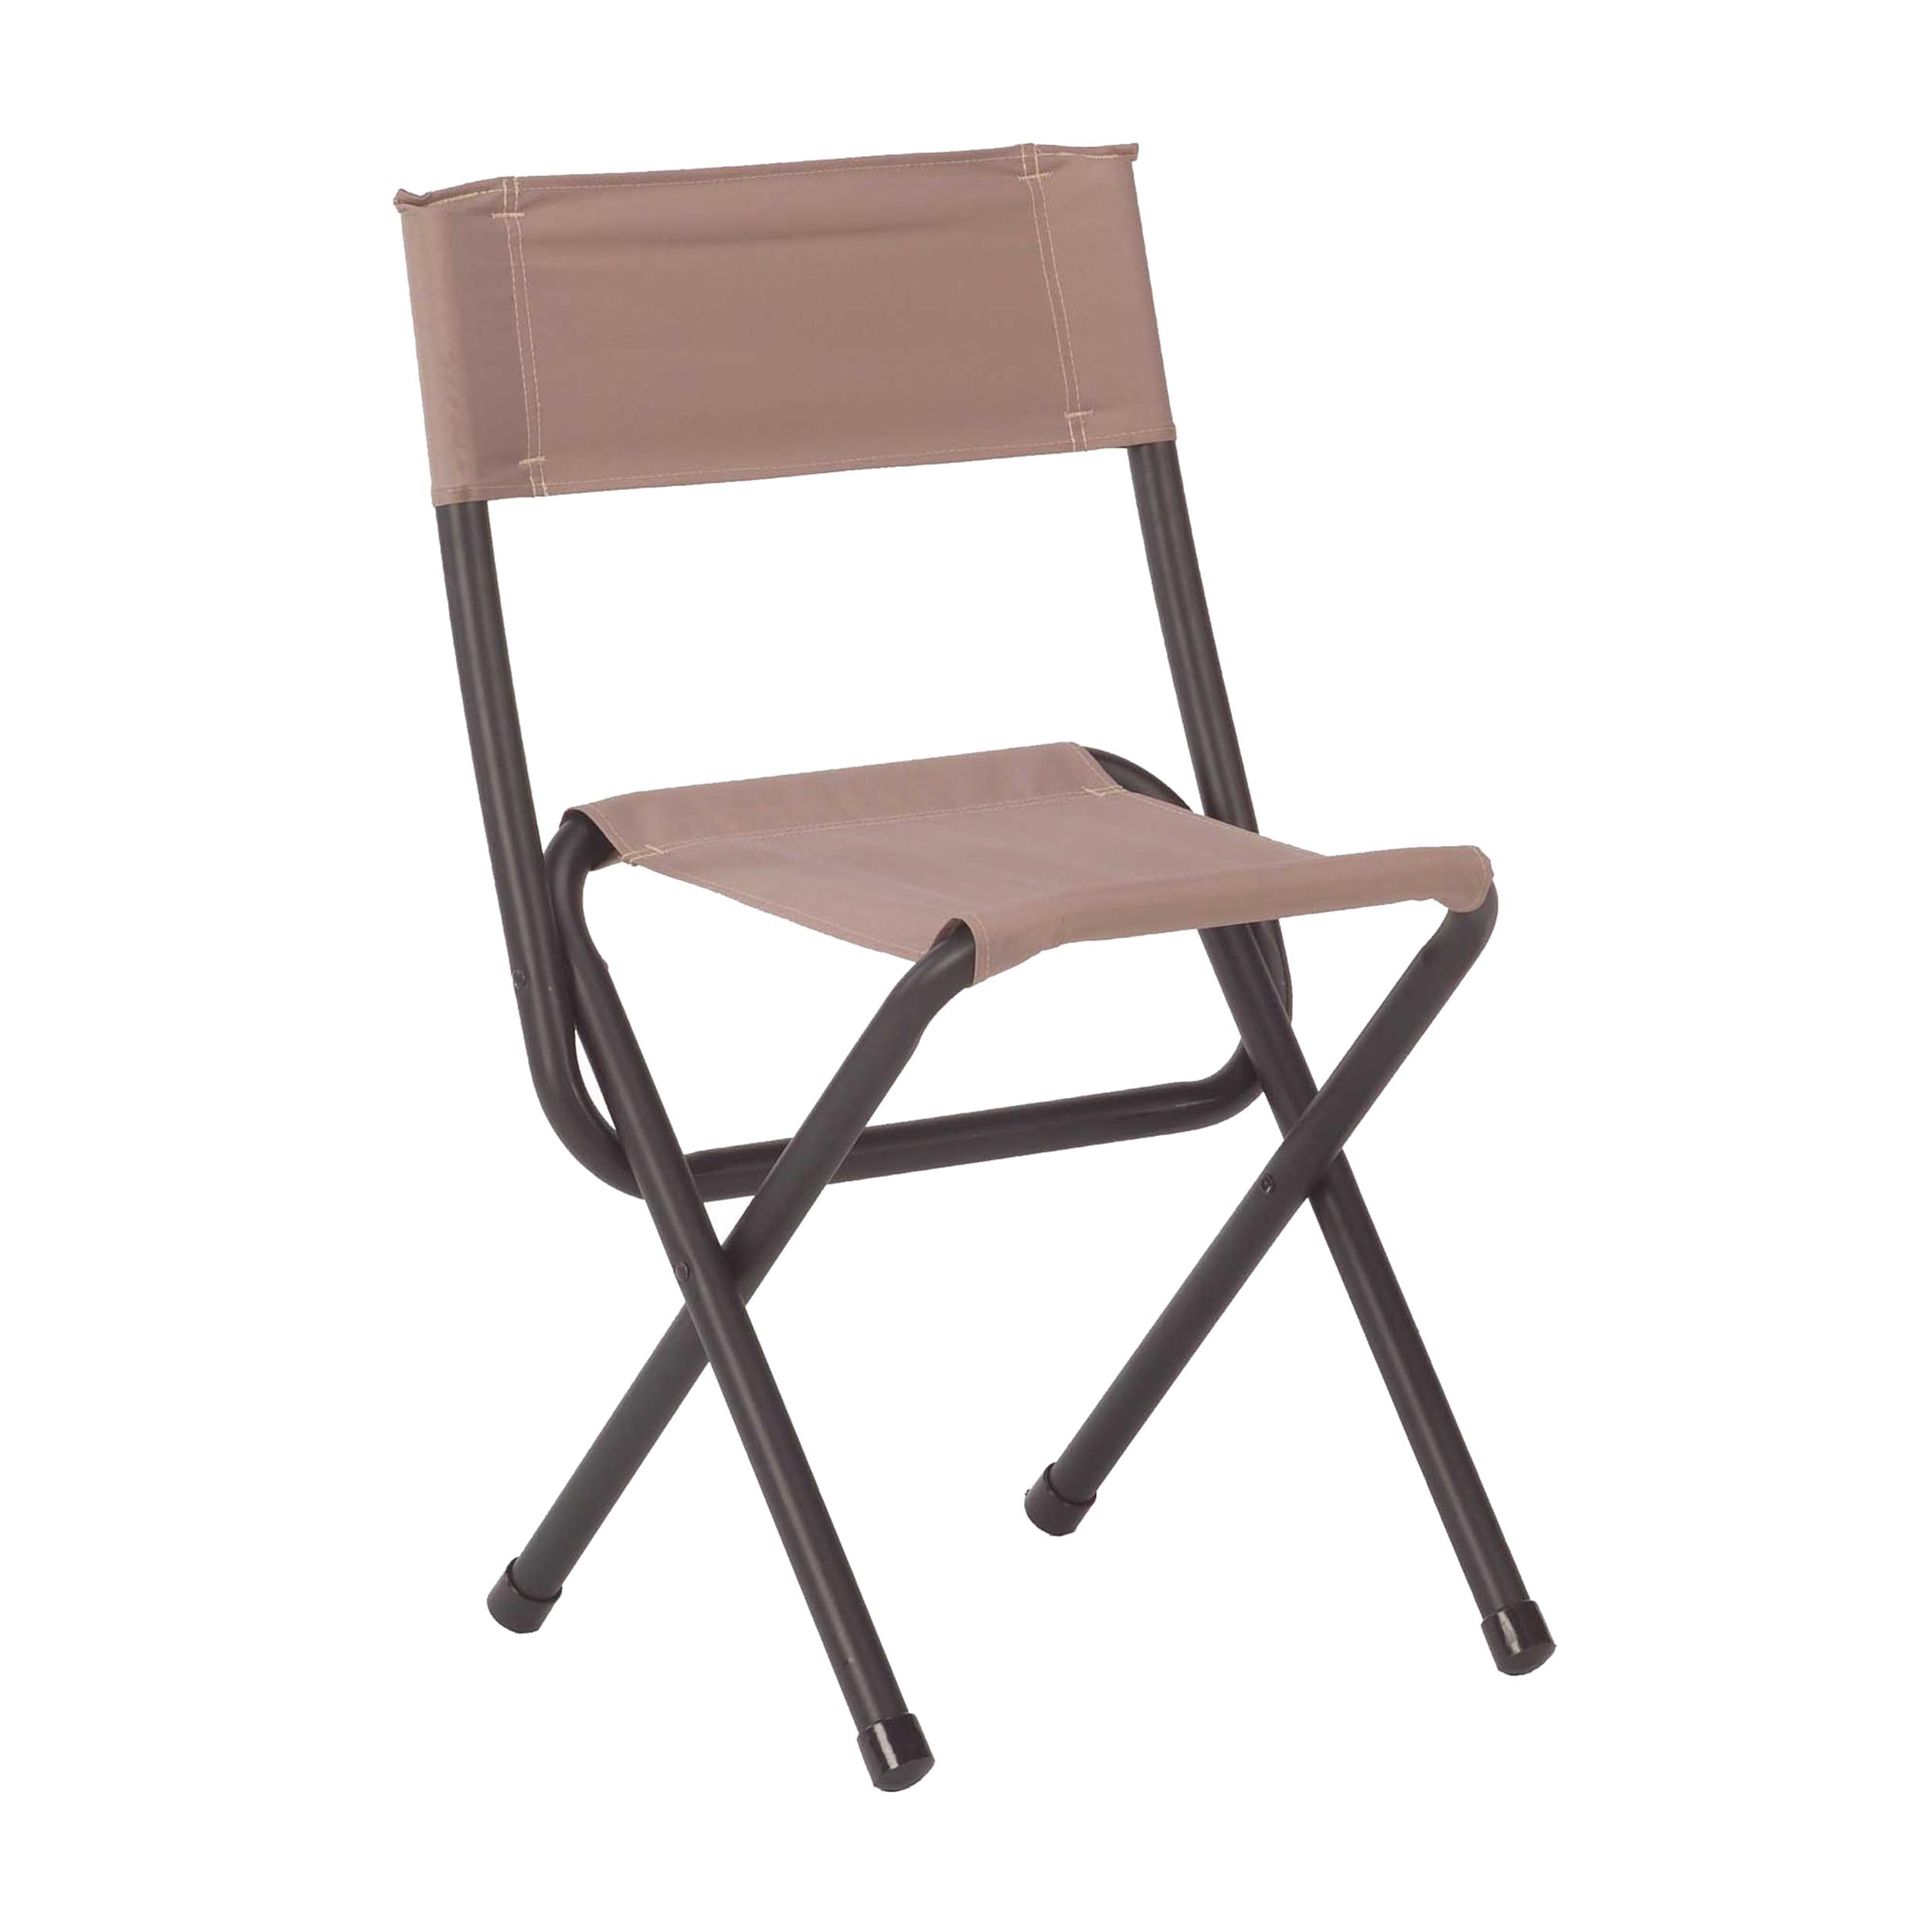 Coleman Chair - Woodsman II